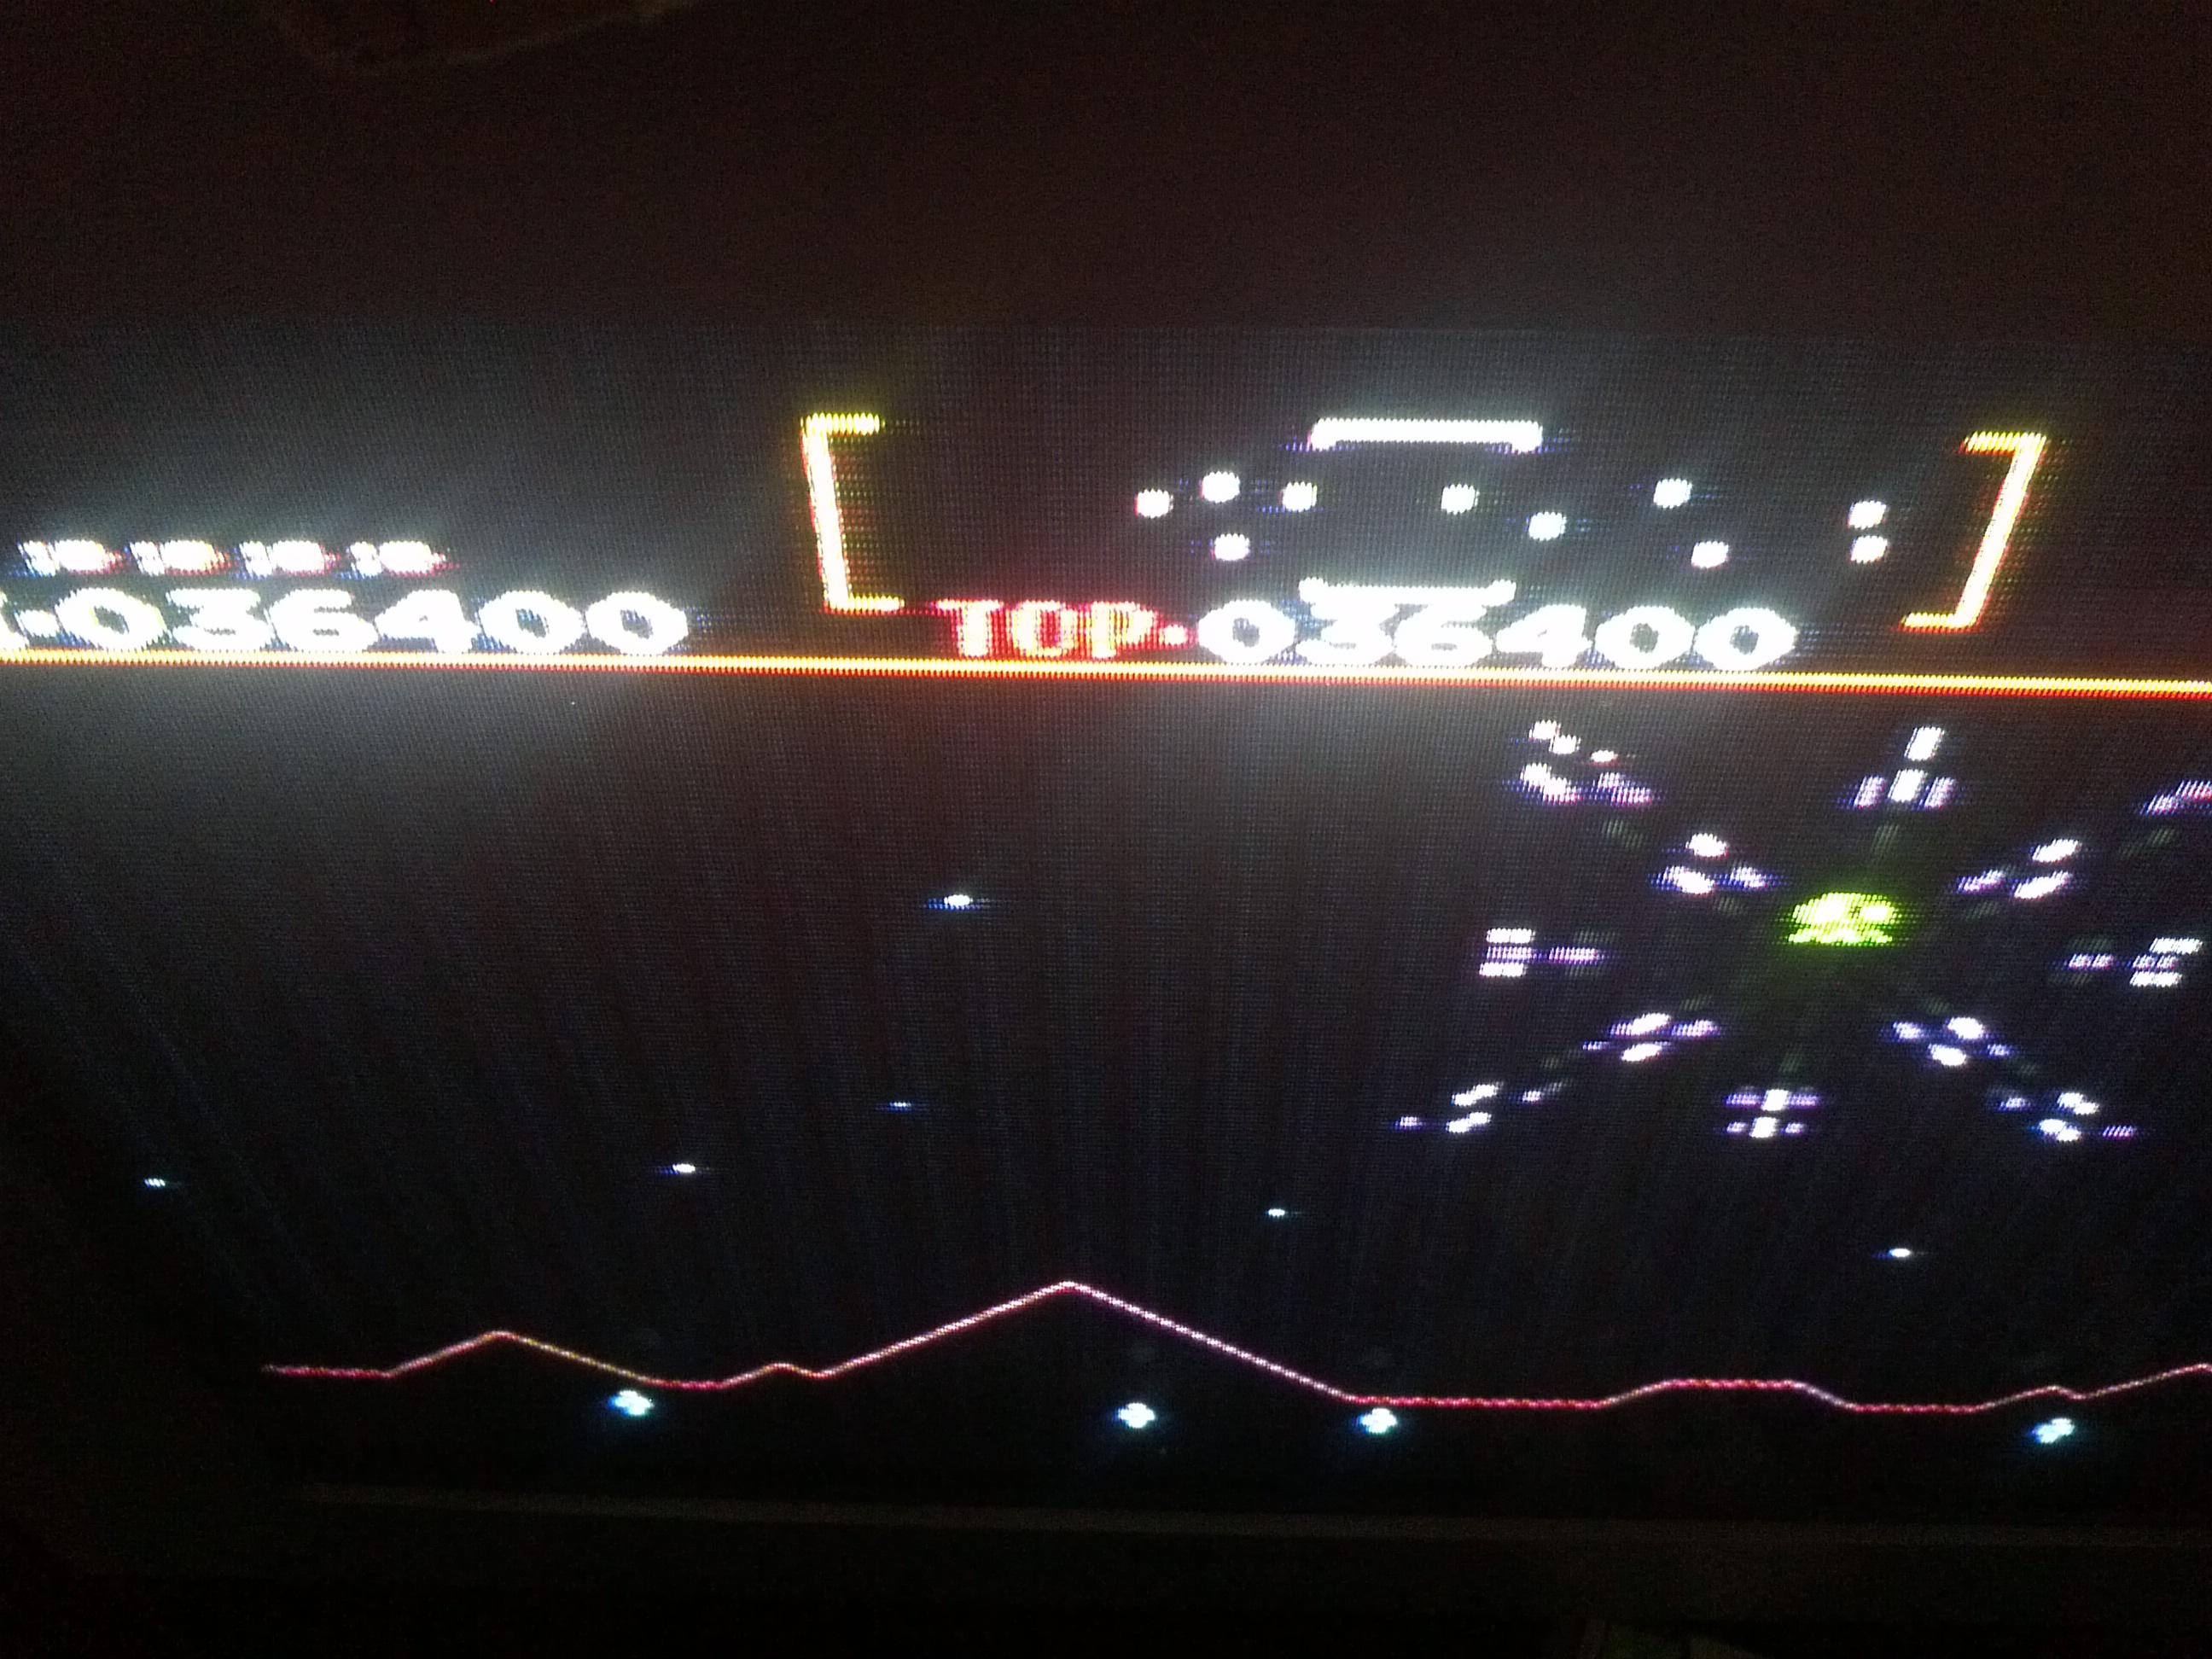 Liduario: Defender II (NES/Famicom) 36,400 points on 2014-03-08 16:36:55